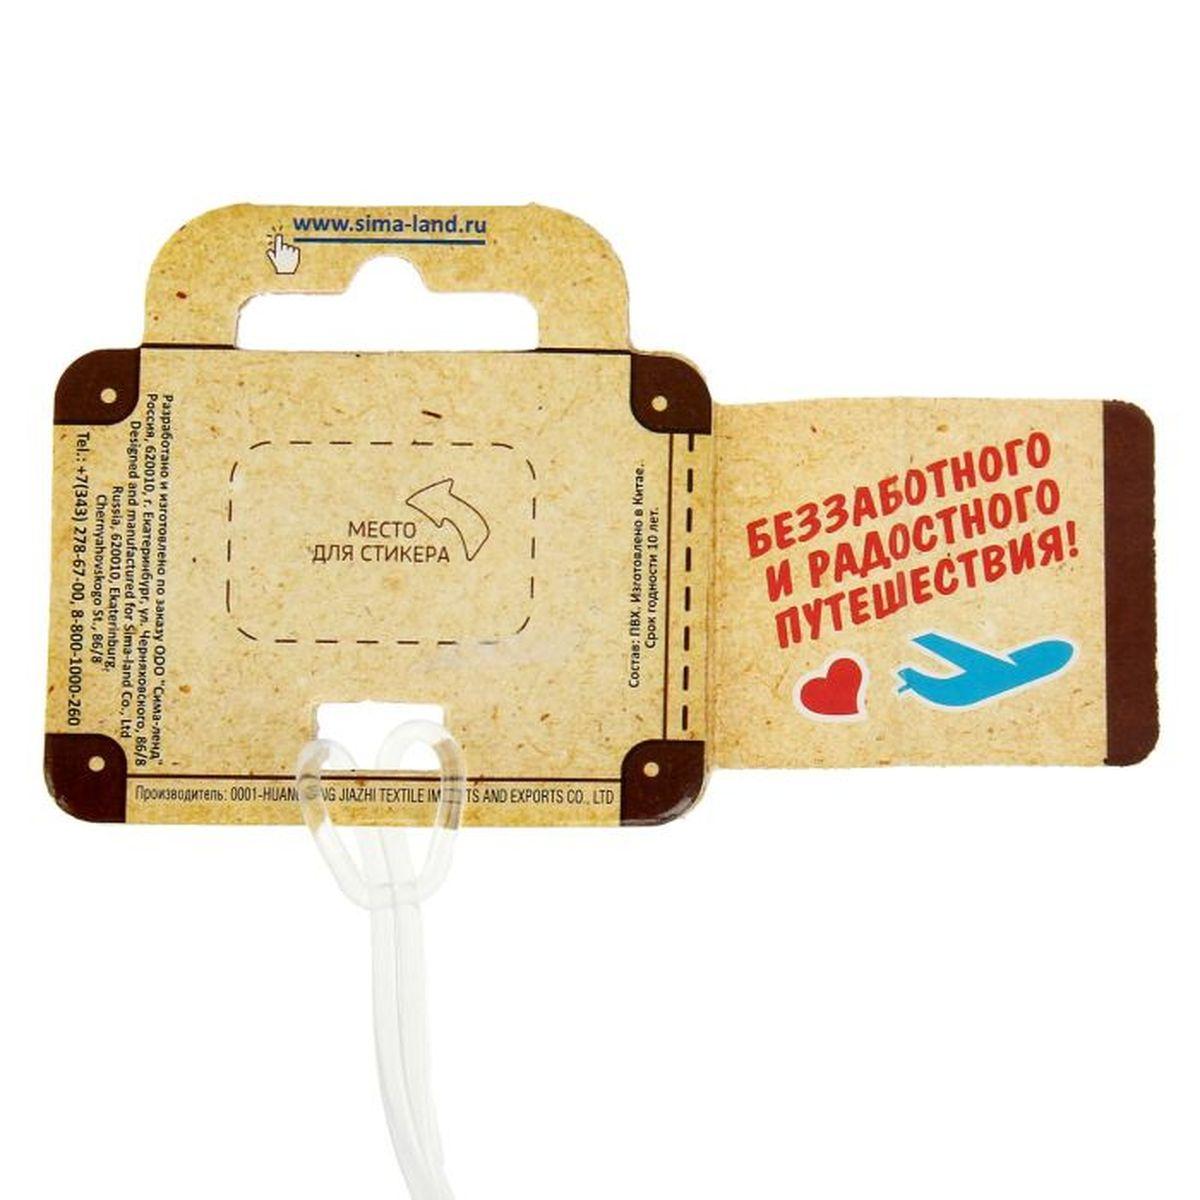 "Бирка на чемодан Sima-land ""Не твое - не трожь"", 6,5 х 11 см. 1156282"